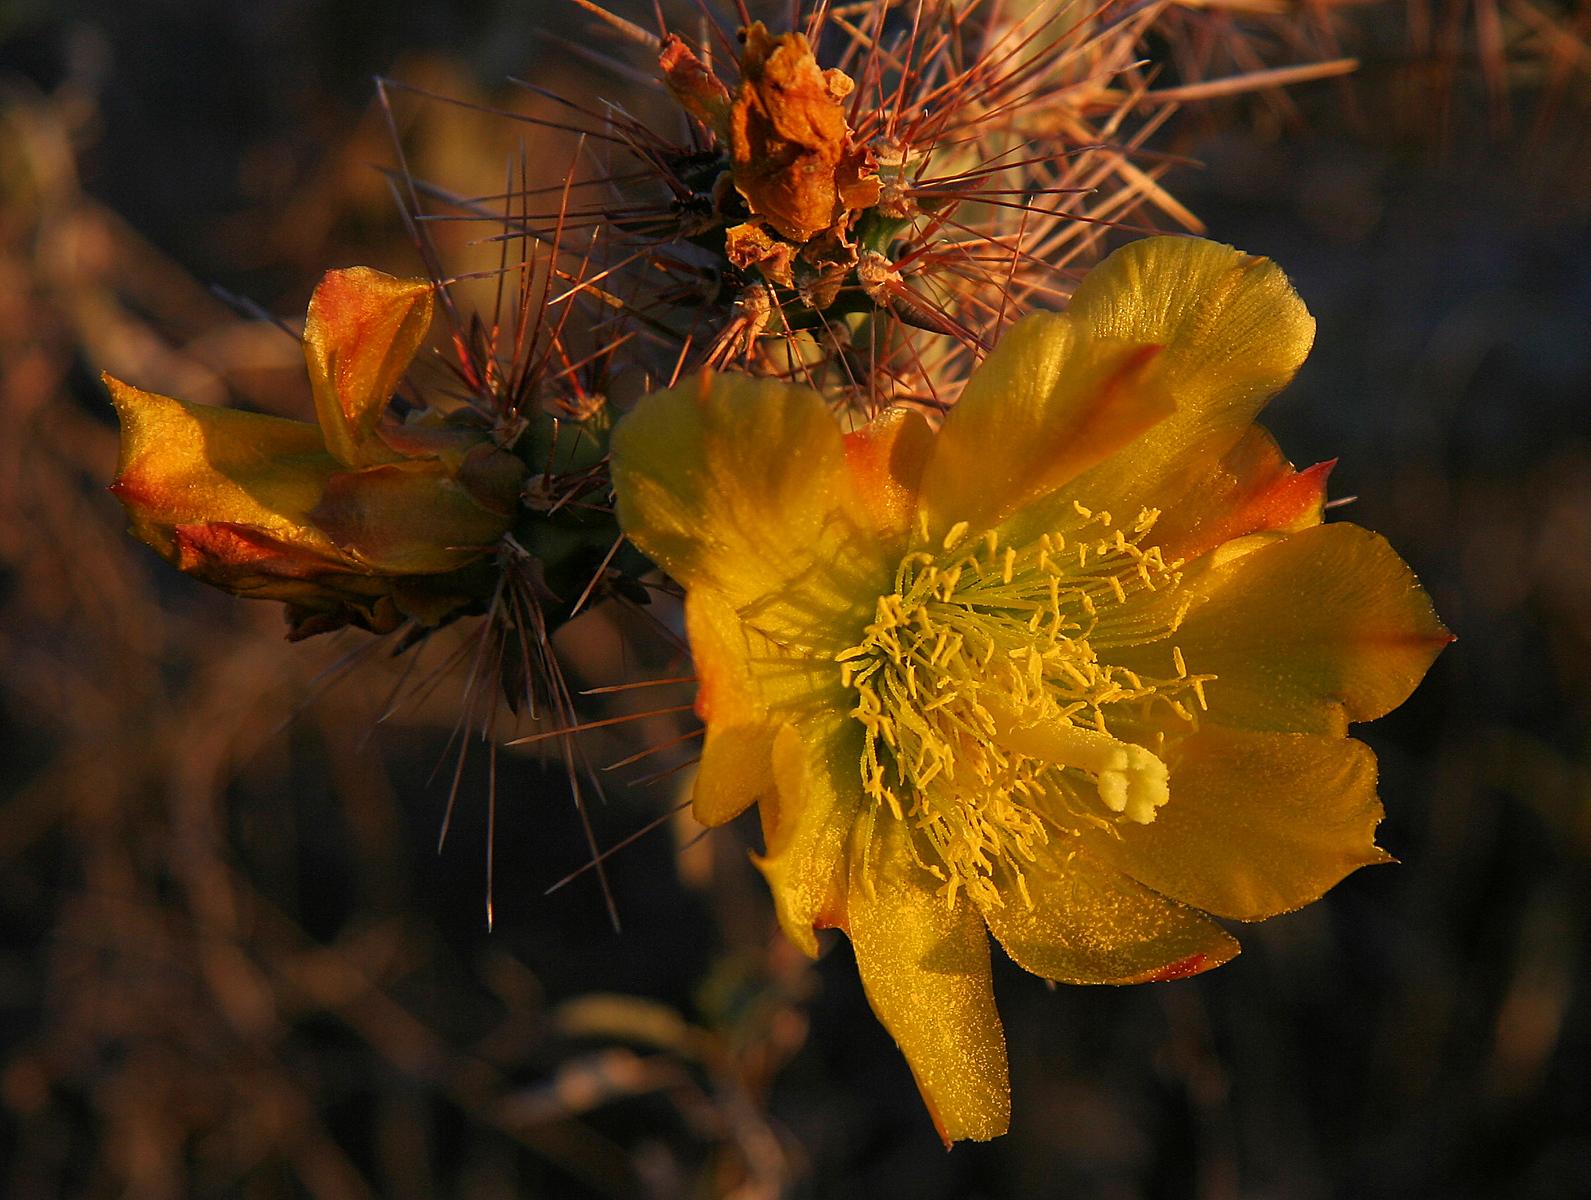 Sunset Cactus Blossum